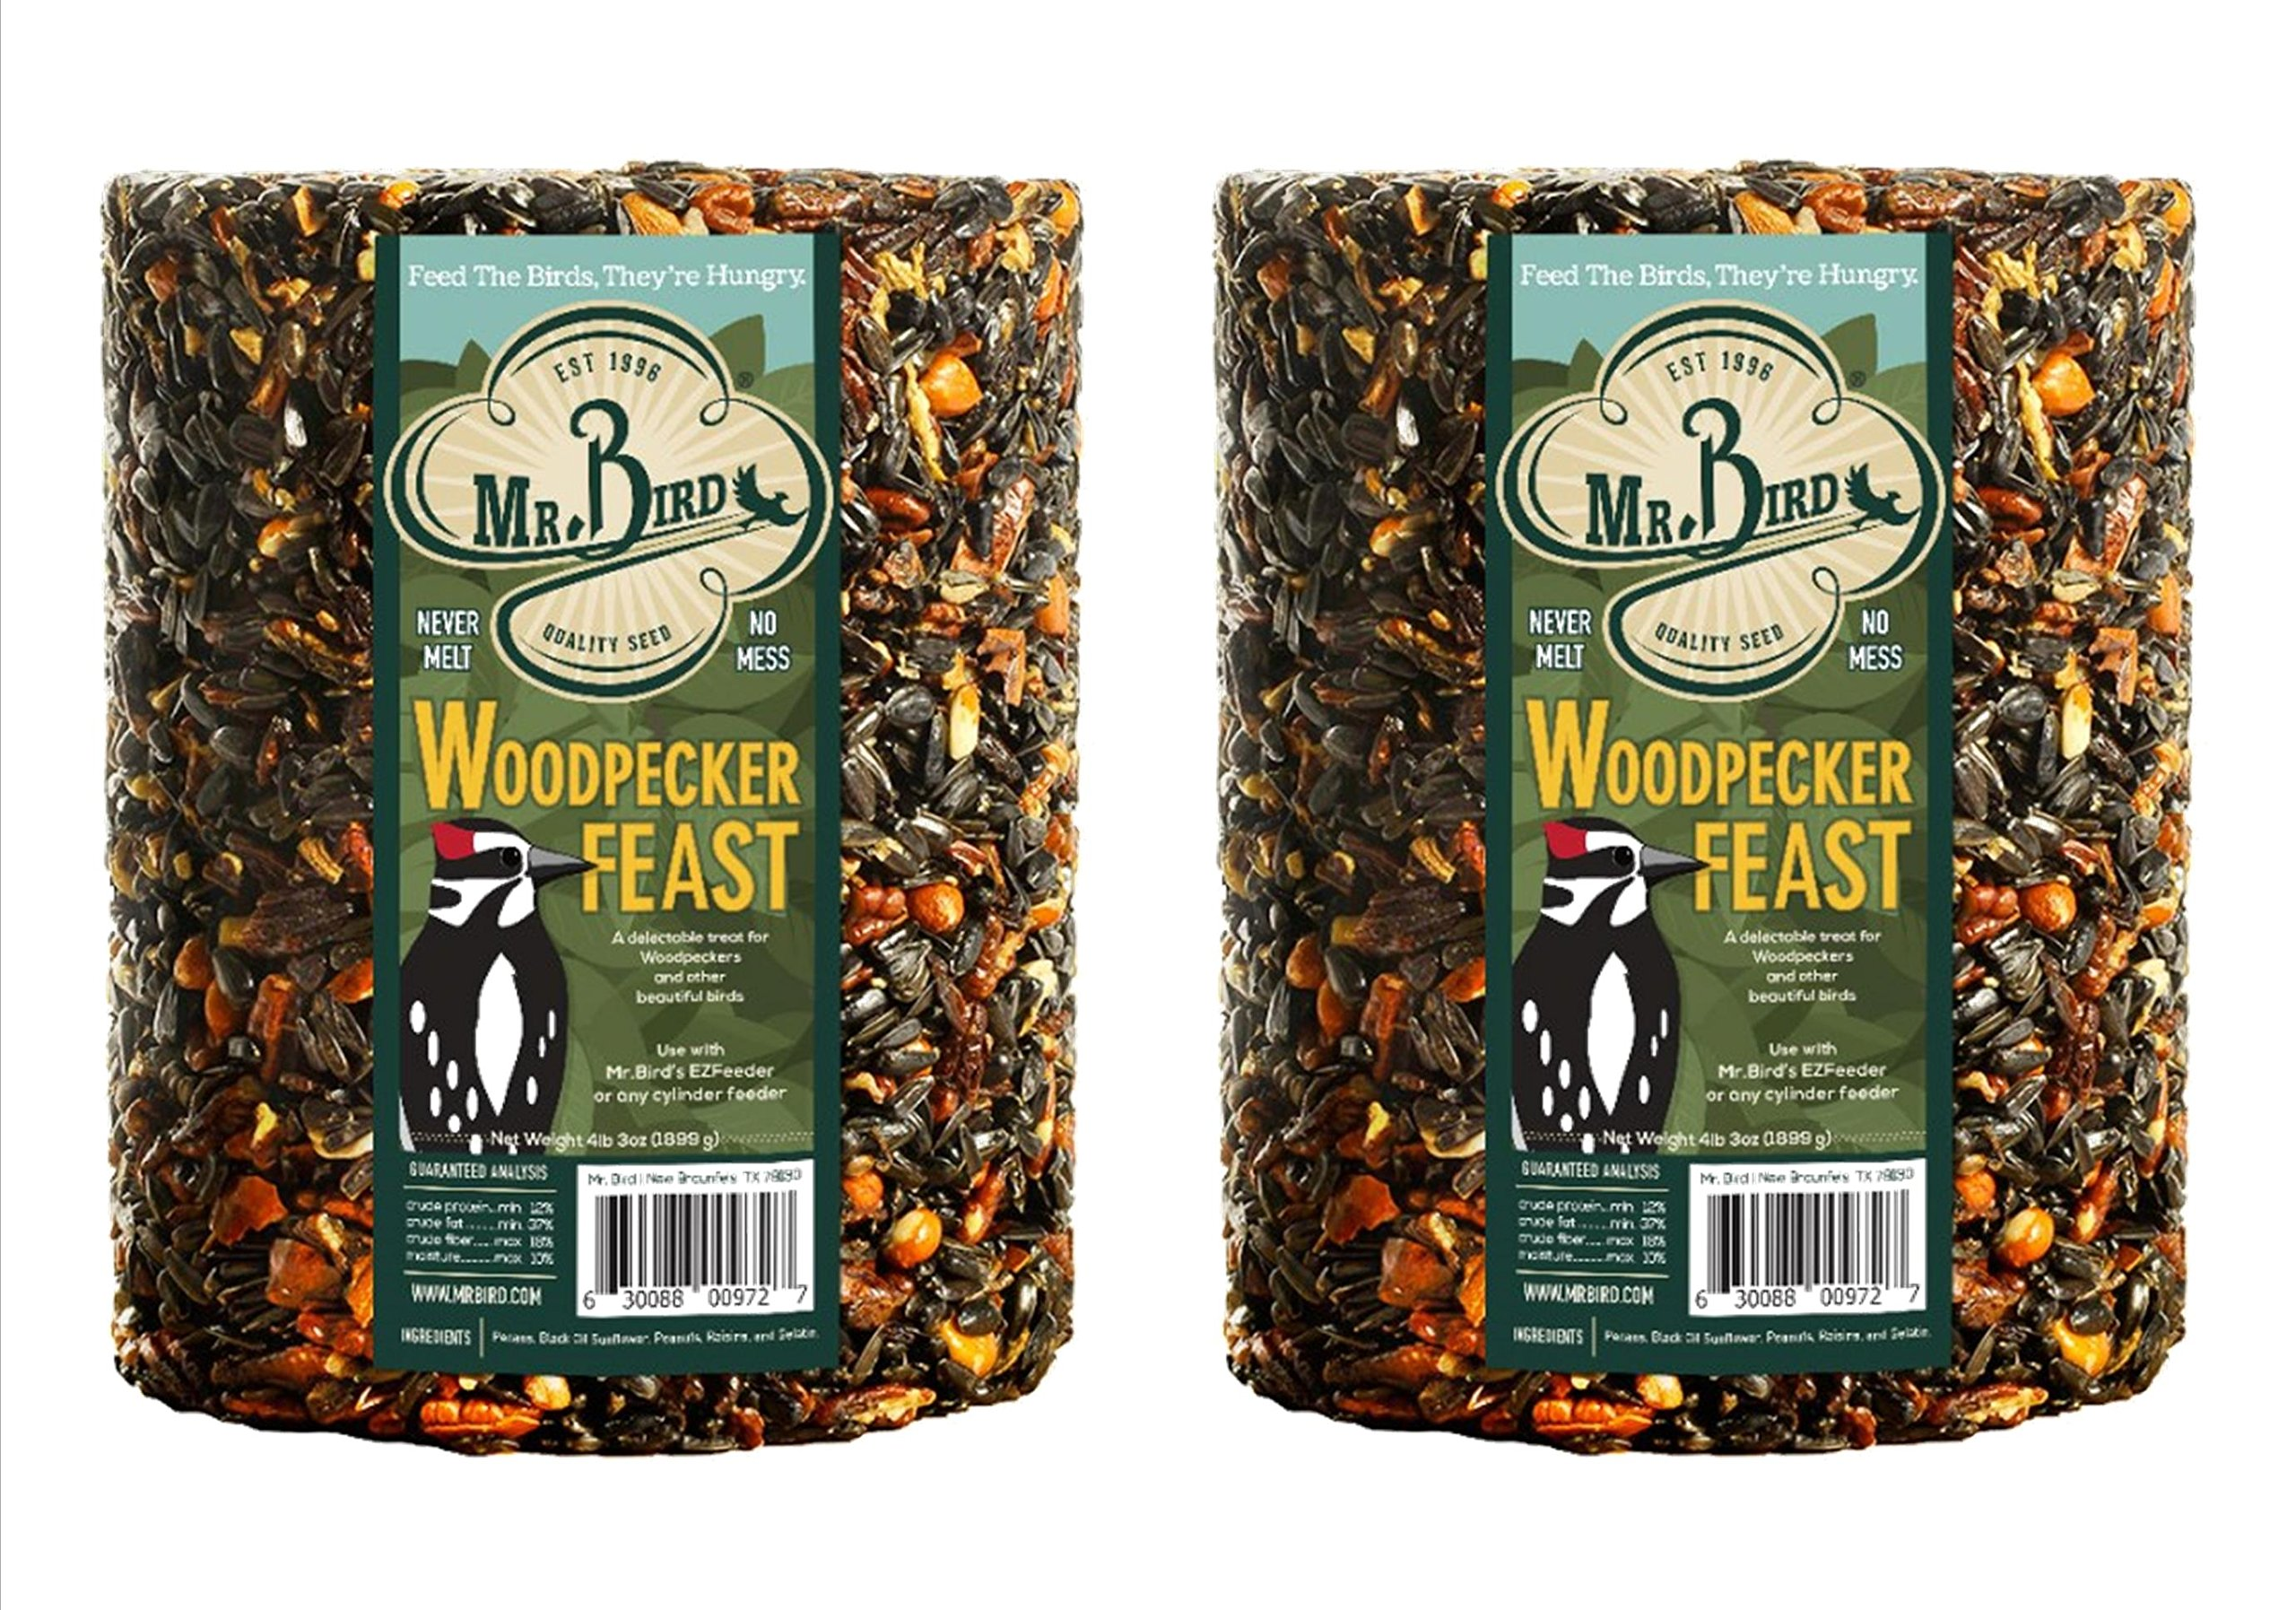 2-Pack of Mr. Bird Woodpecker Feast Large Wild Bird Seed Cylinder 4 lbs. 2 oz.